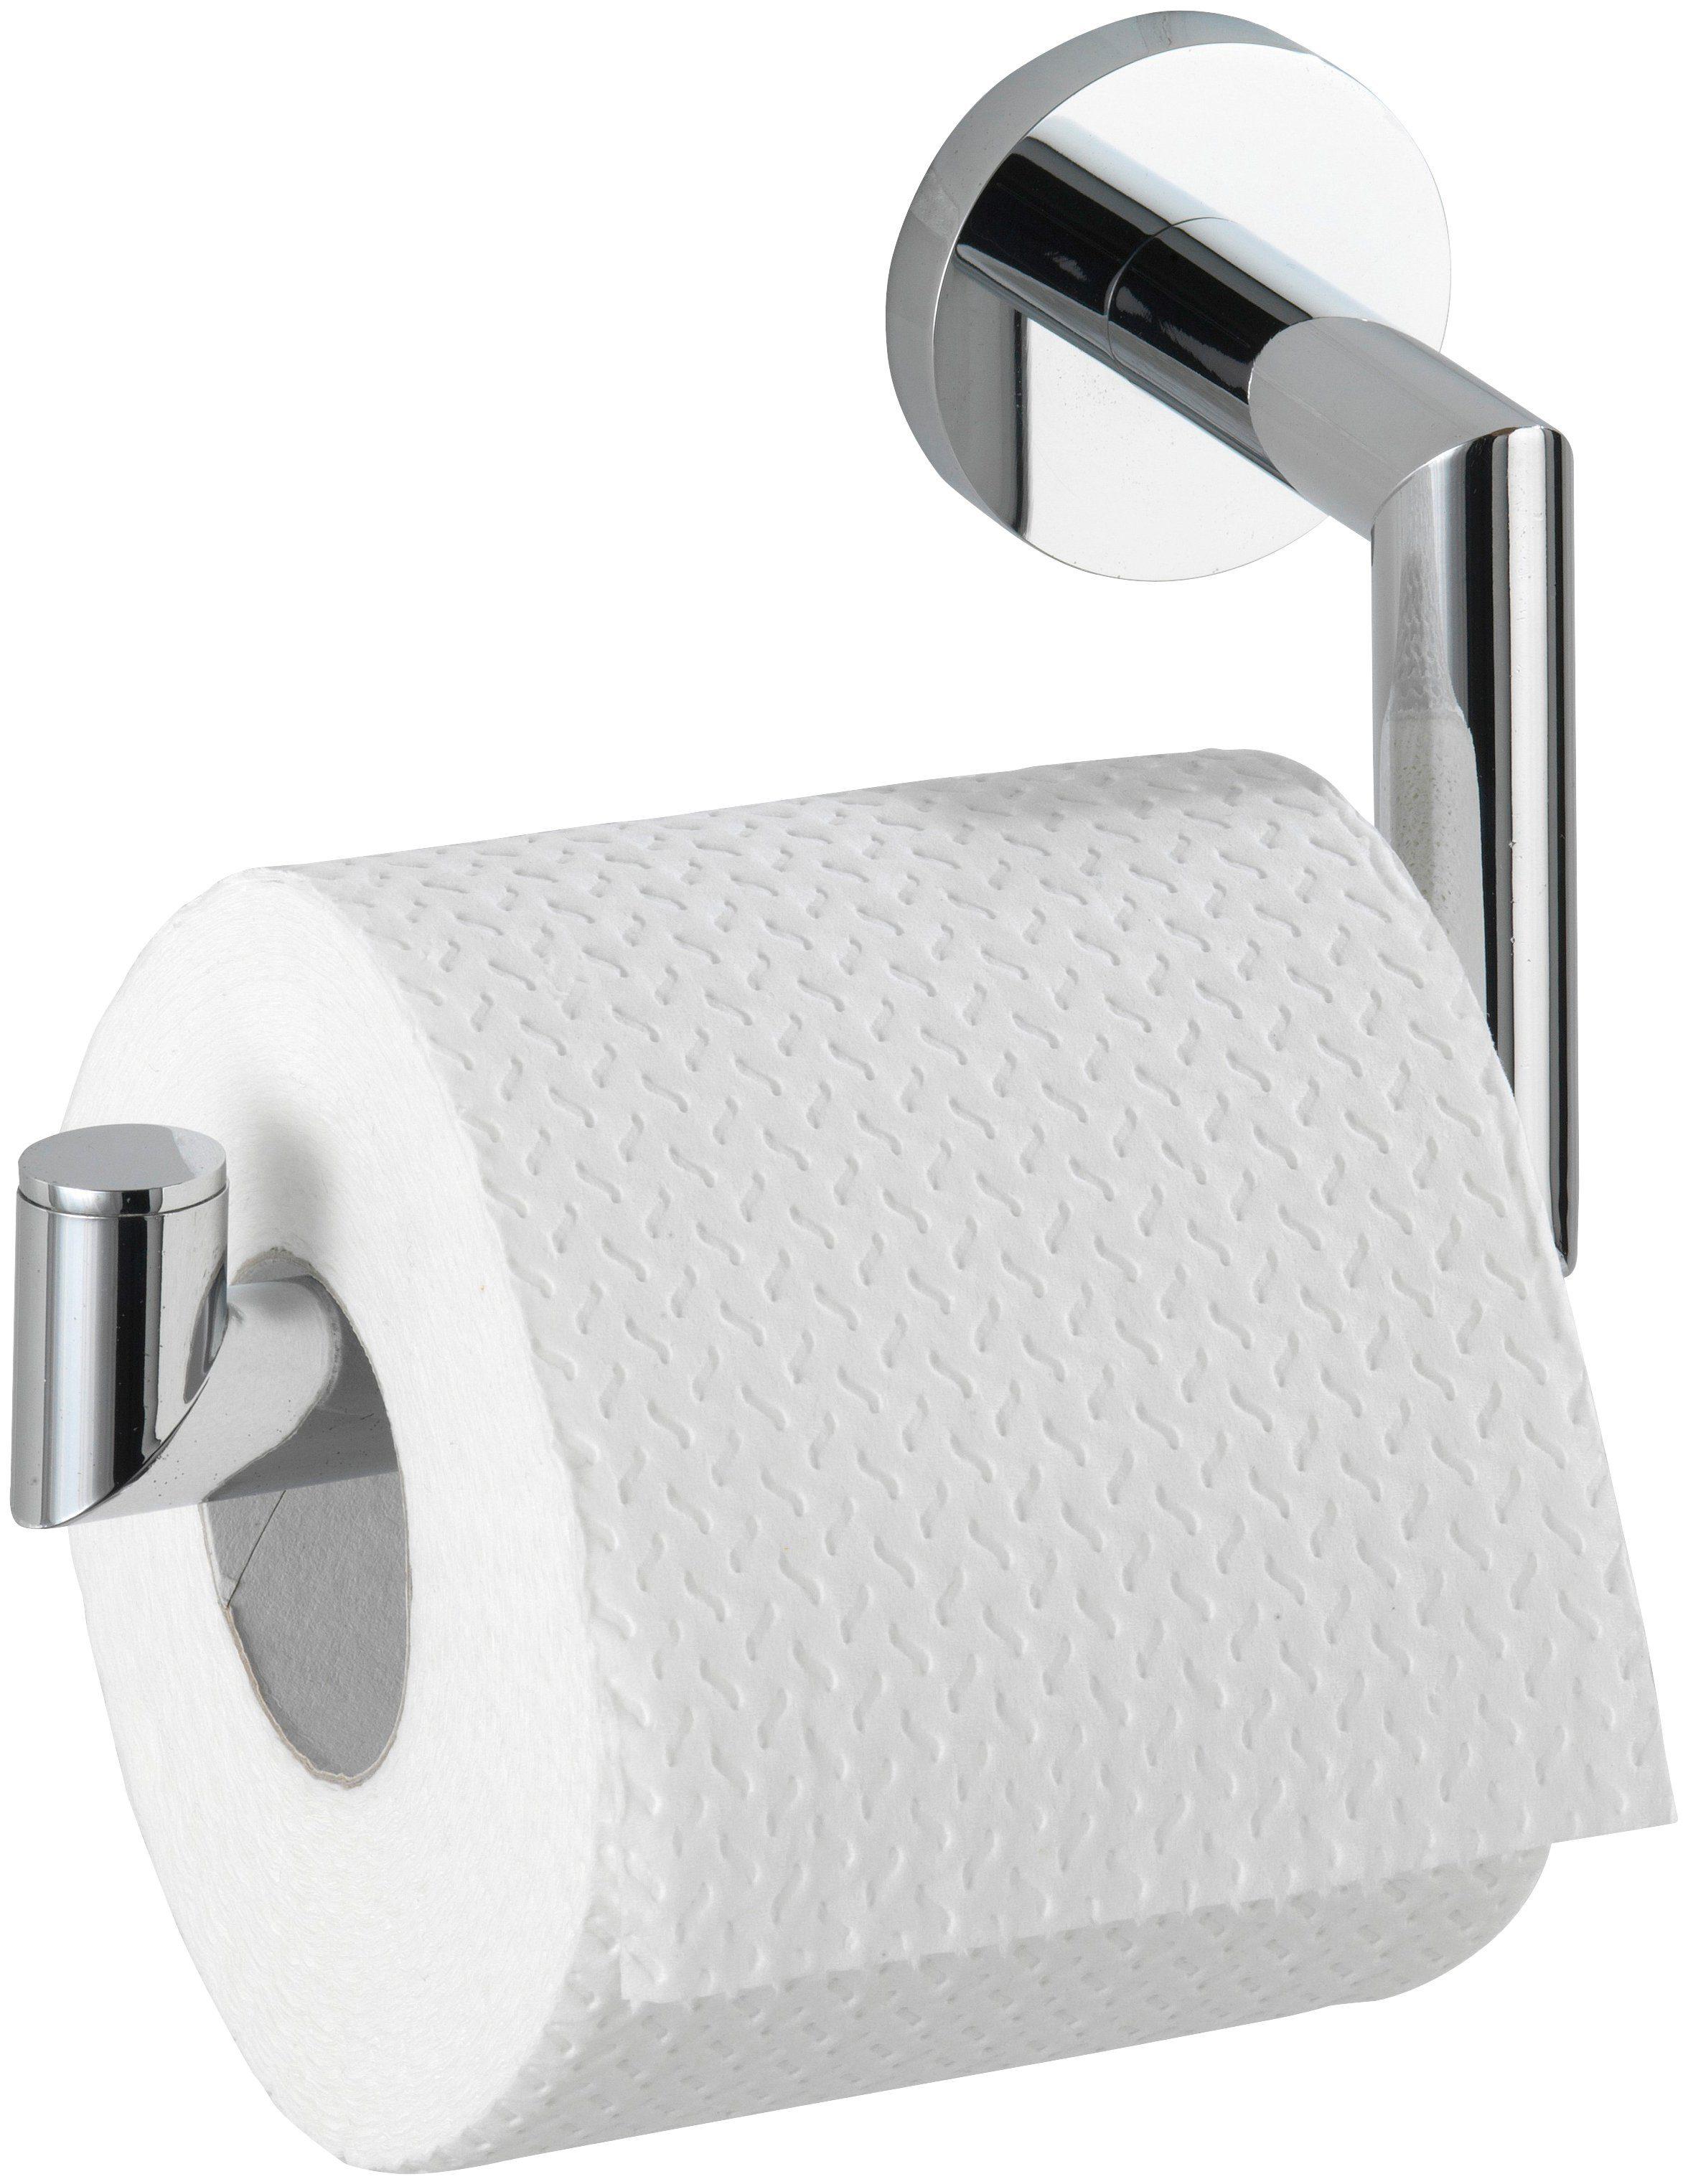 Toilettenpapierhalter »Power-Loc Toilettenpapierhalter Revello«